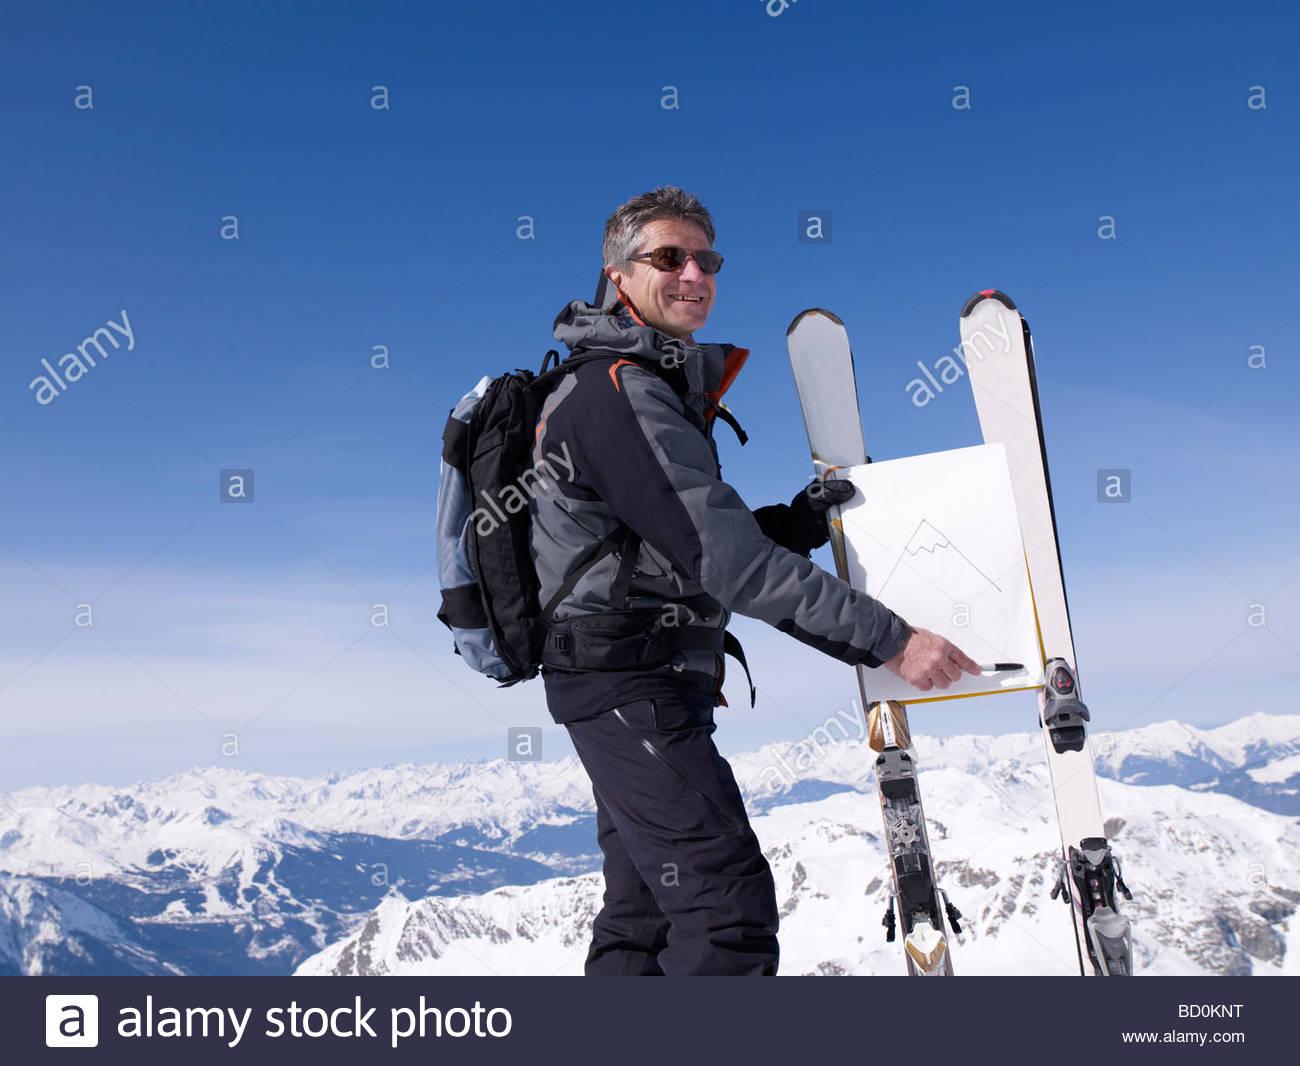 ski instructor teaching - Stock Image